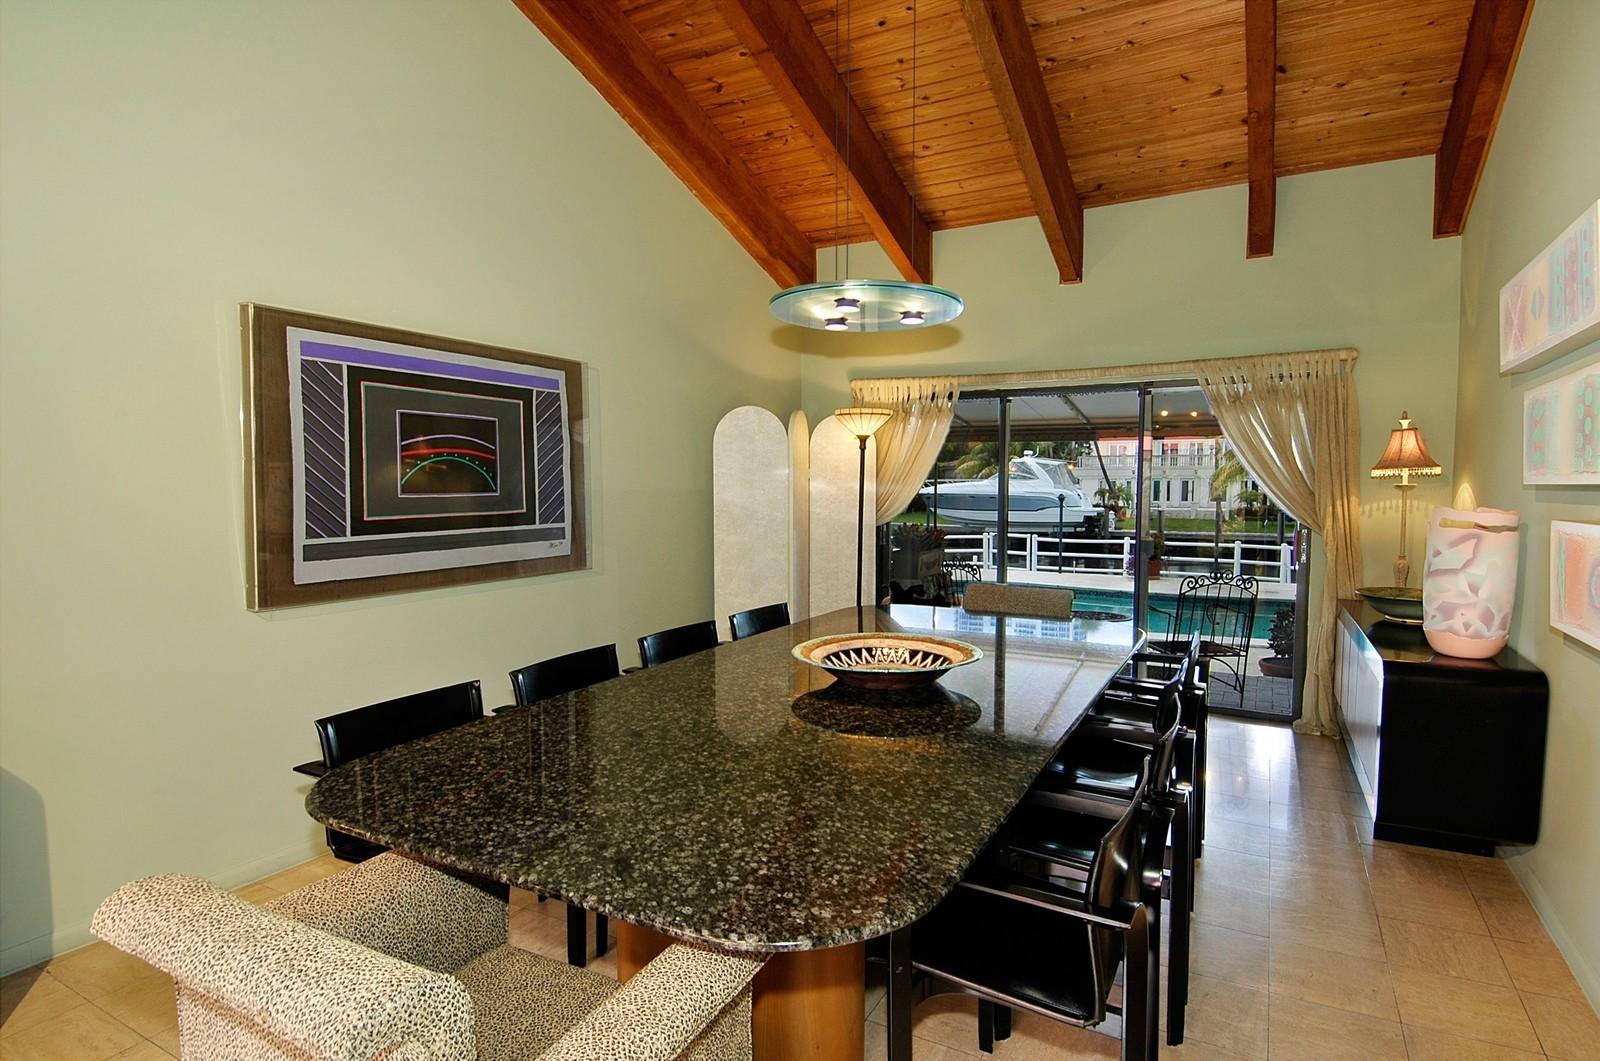 Real Estate Photography - 622 Golden Beach Dr, Golden Beach, FL, 33160 - Dining Room